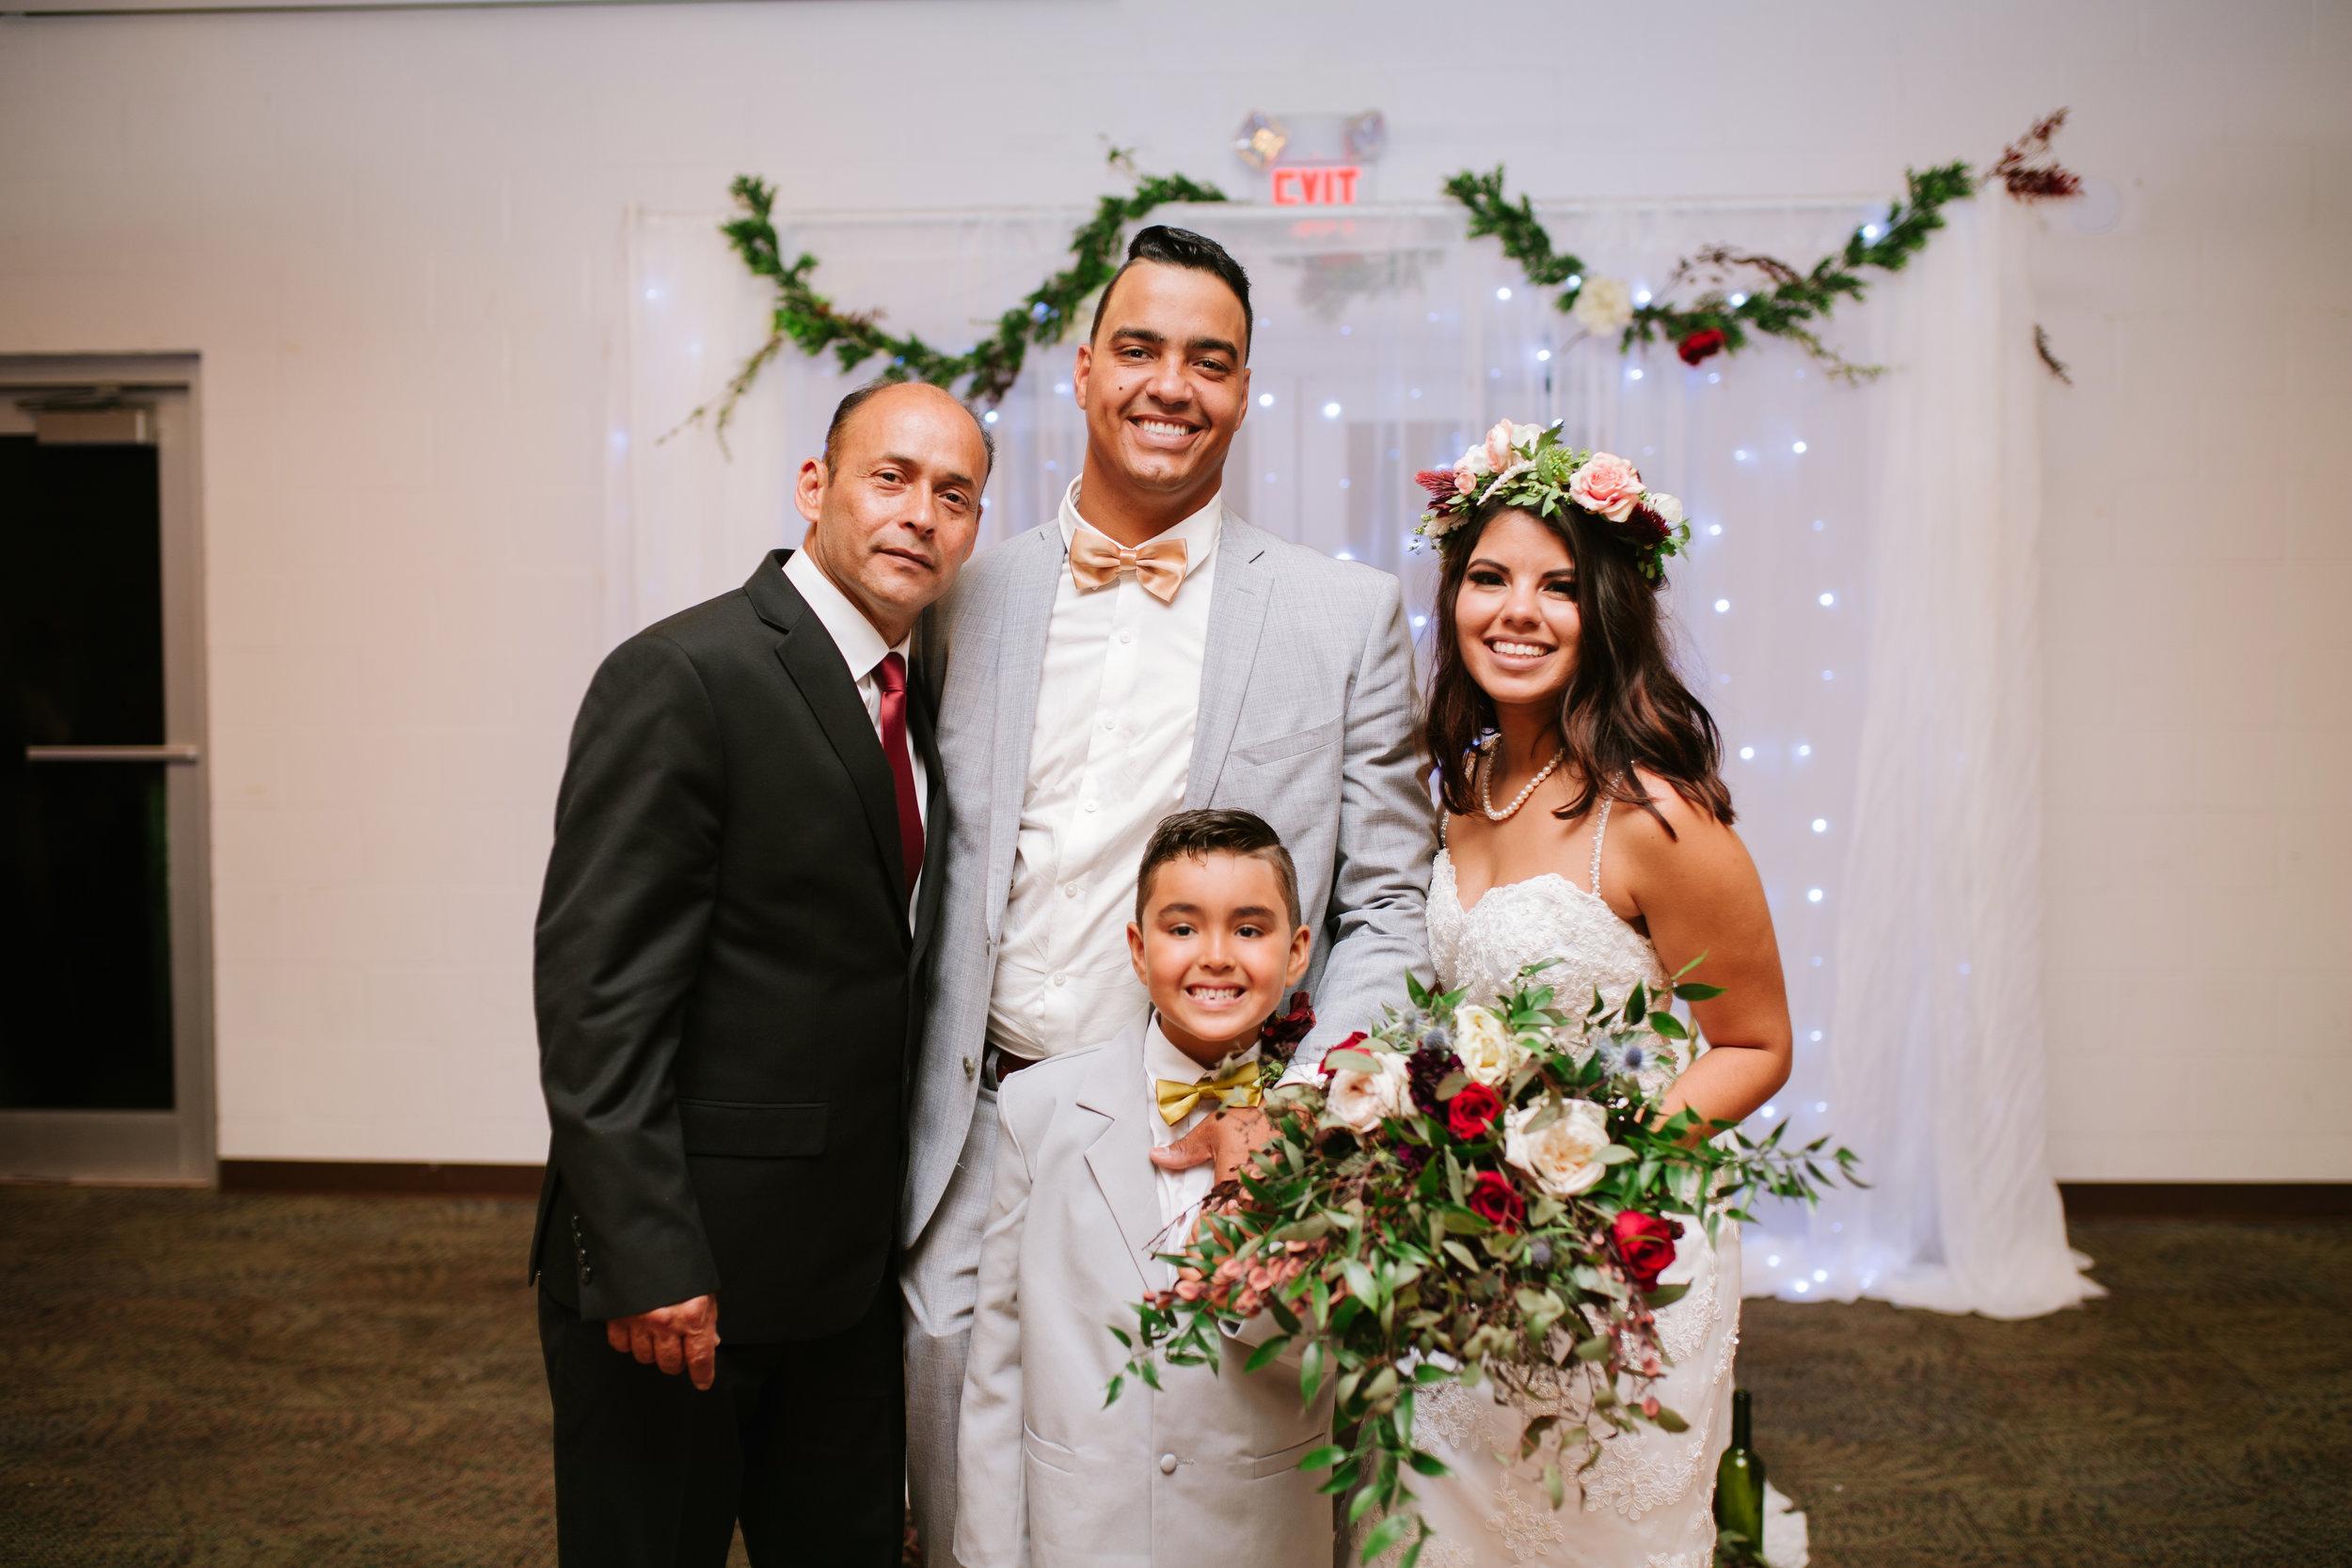 2017.05.23 Barbara and Mauricio Sales Port St Lucie Wedding (587 of 772).jpg